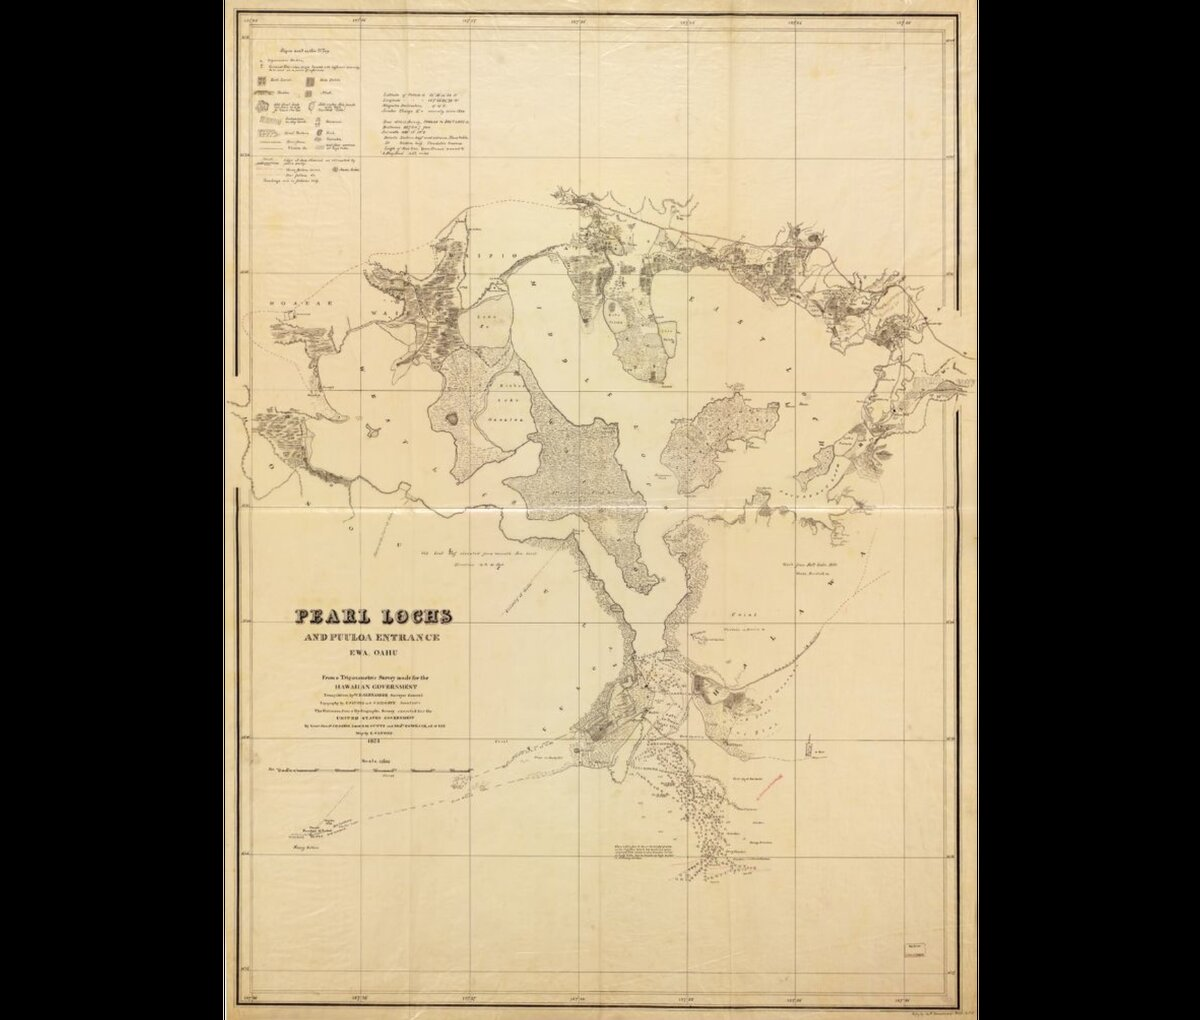 1873 map of Pearl Lochs and Puuloa Entrance, Ewa, Oahu, Hawaii